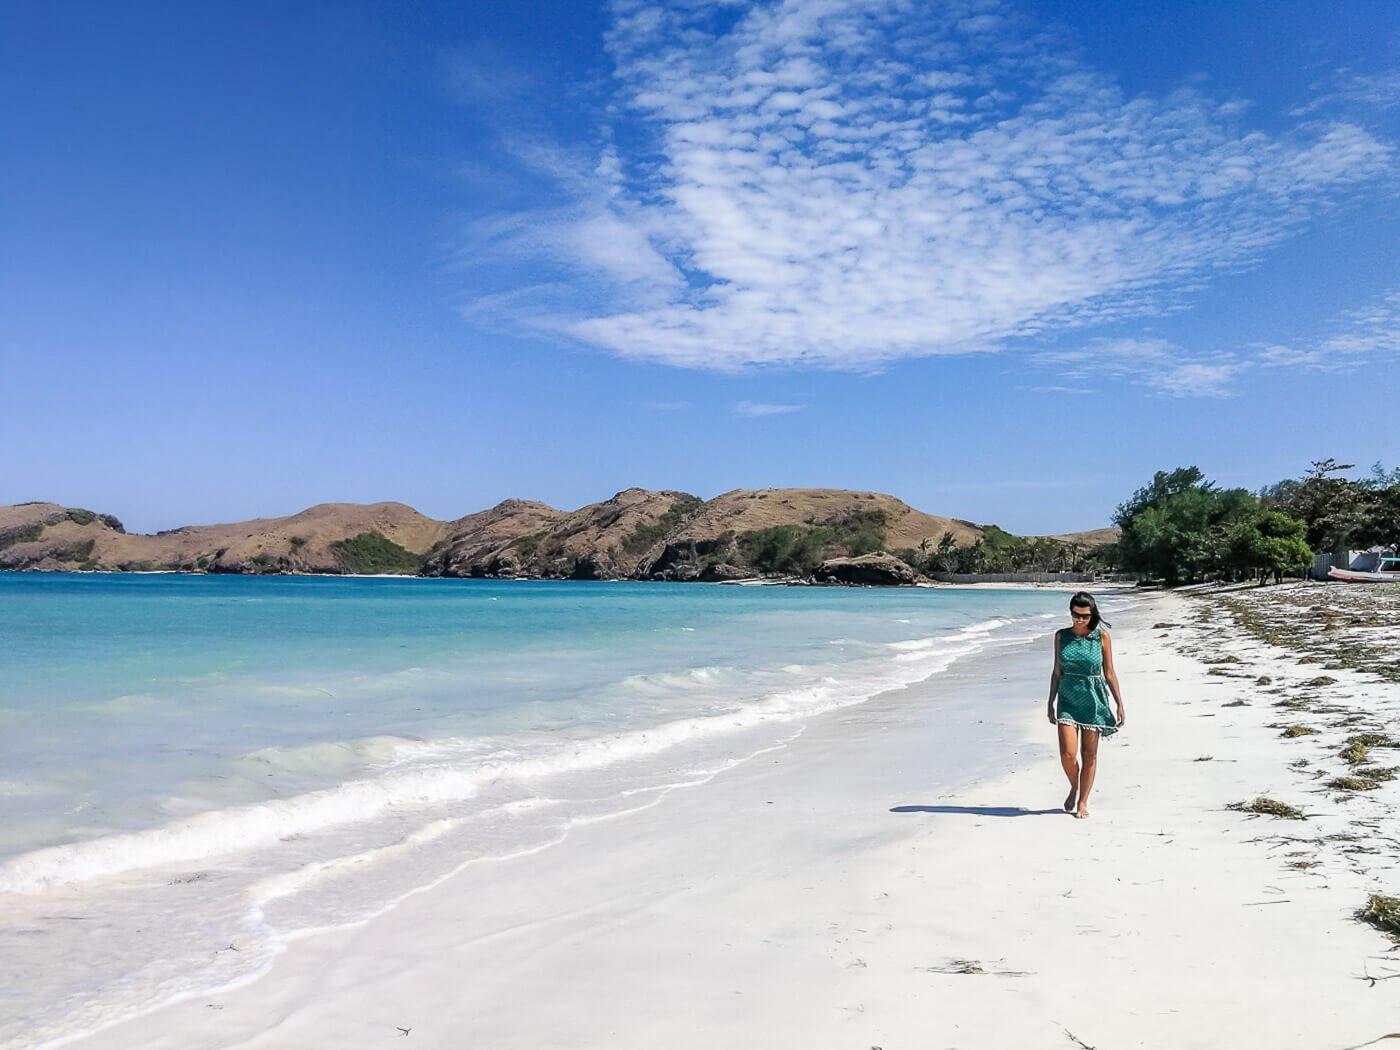 Viagem para Indonésia - Praia Lombok